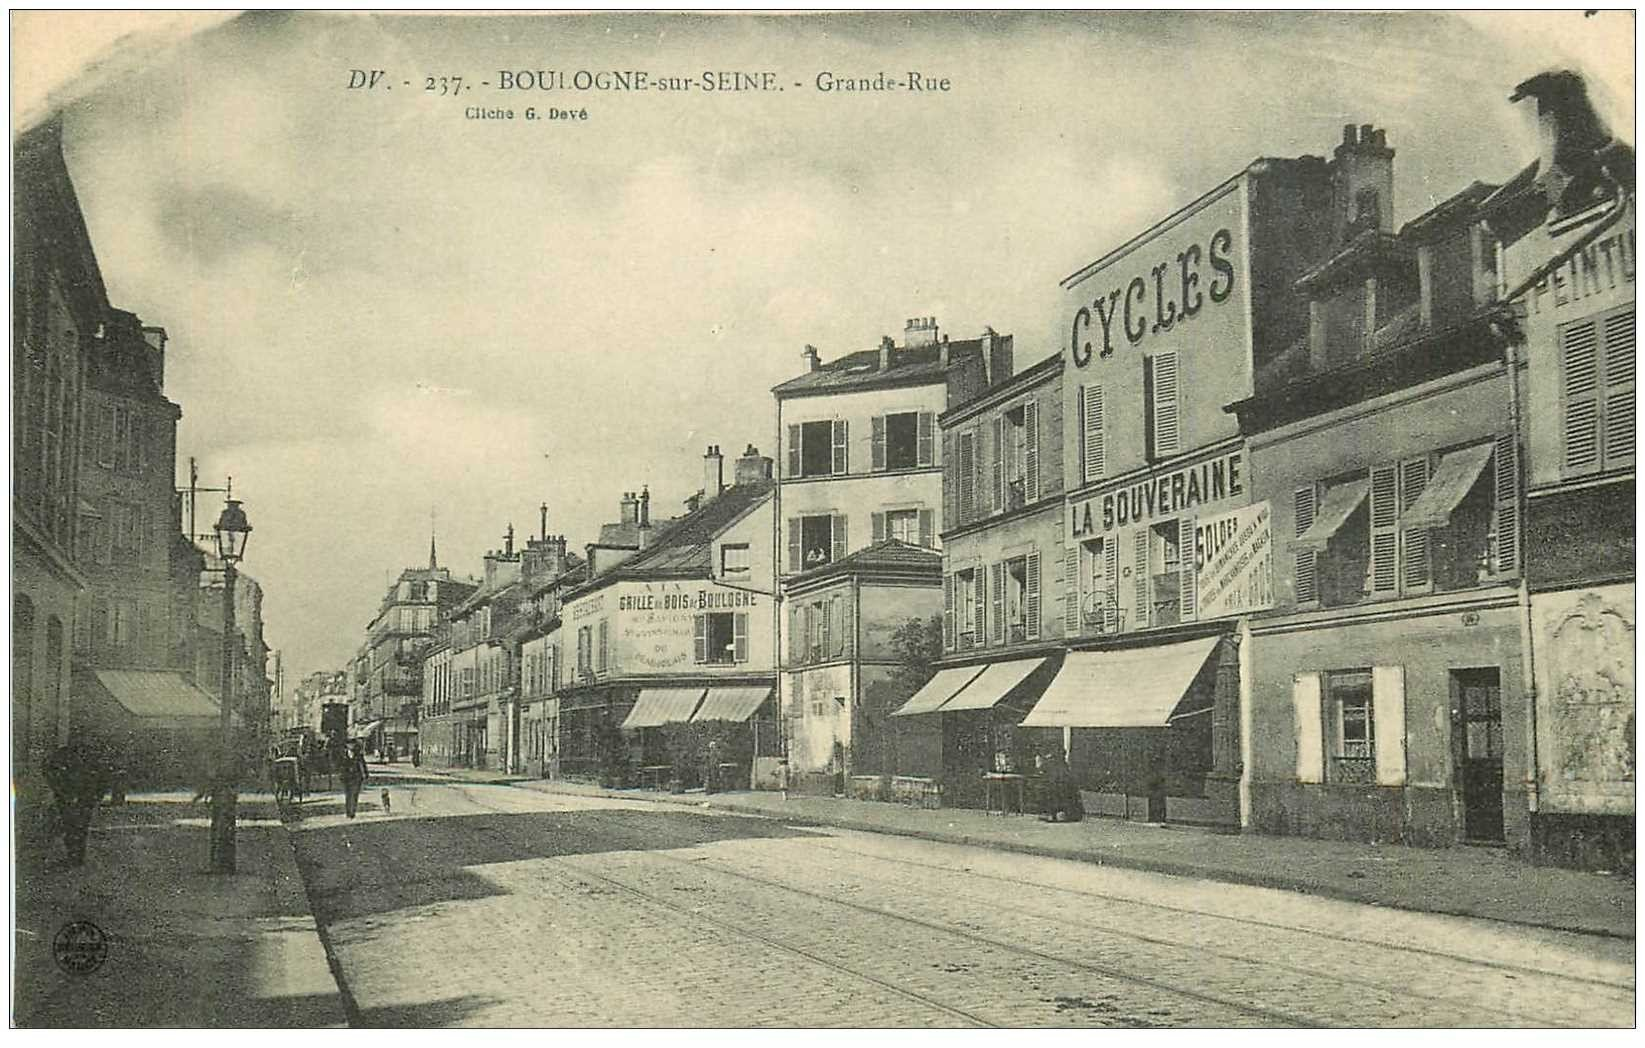 emigration russe Boulogne sur seine Billancourt France Billankoursk guerre années 20 русская эмиграция франция